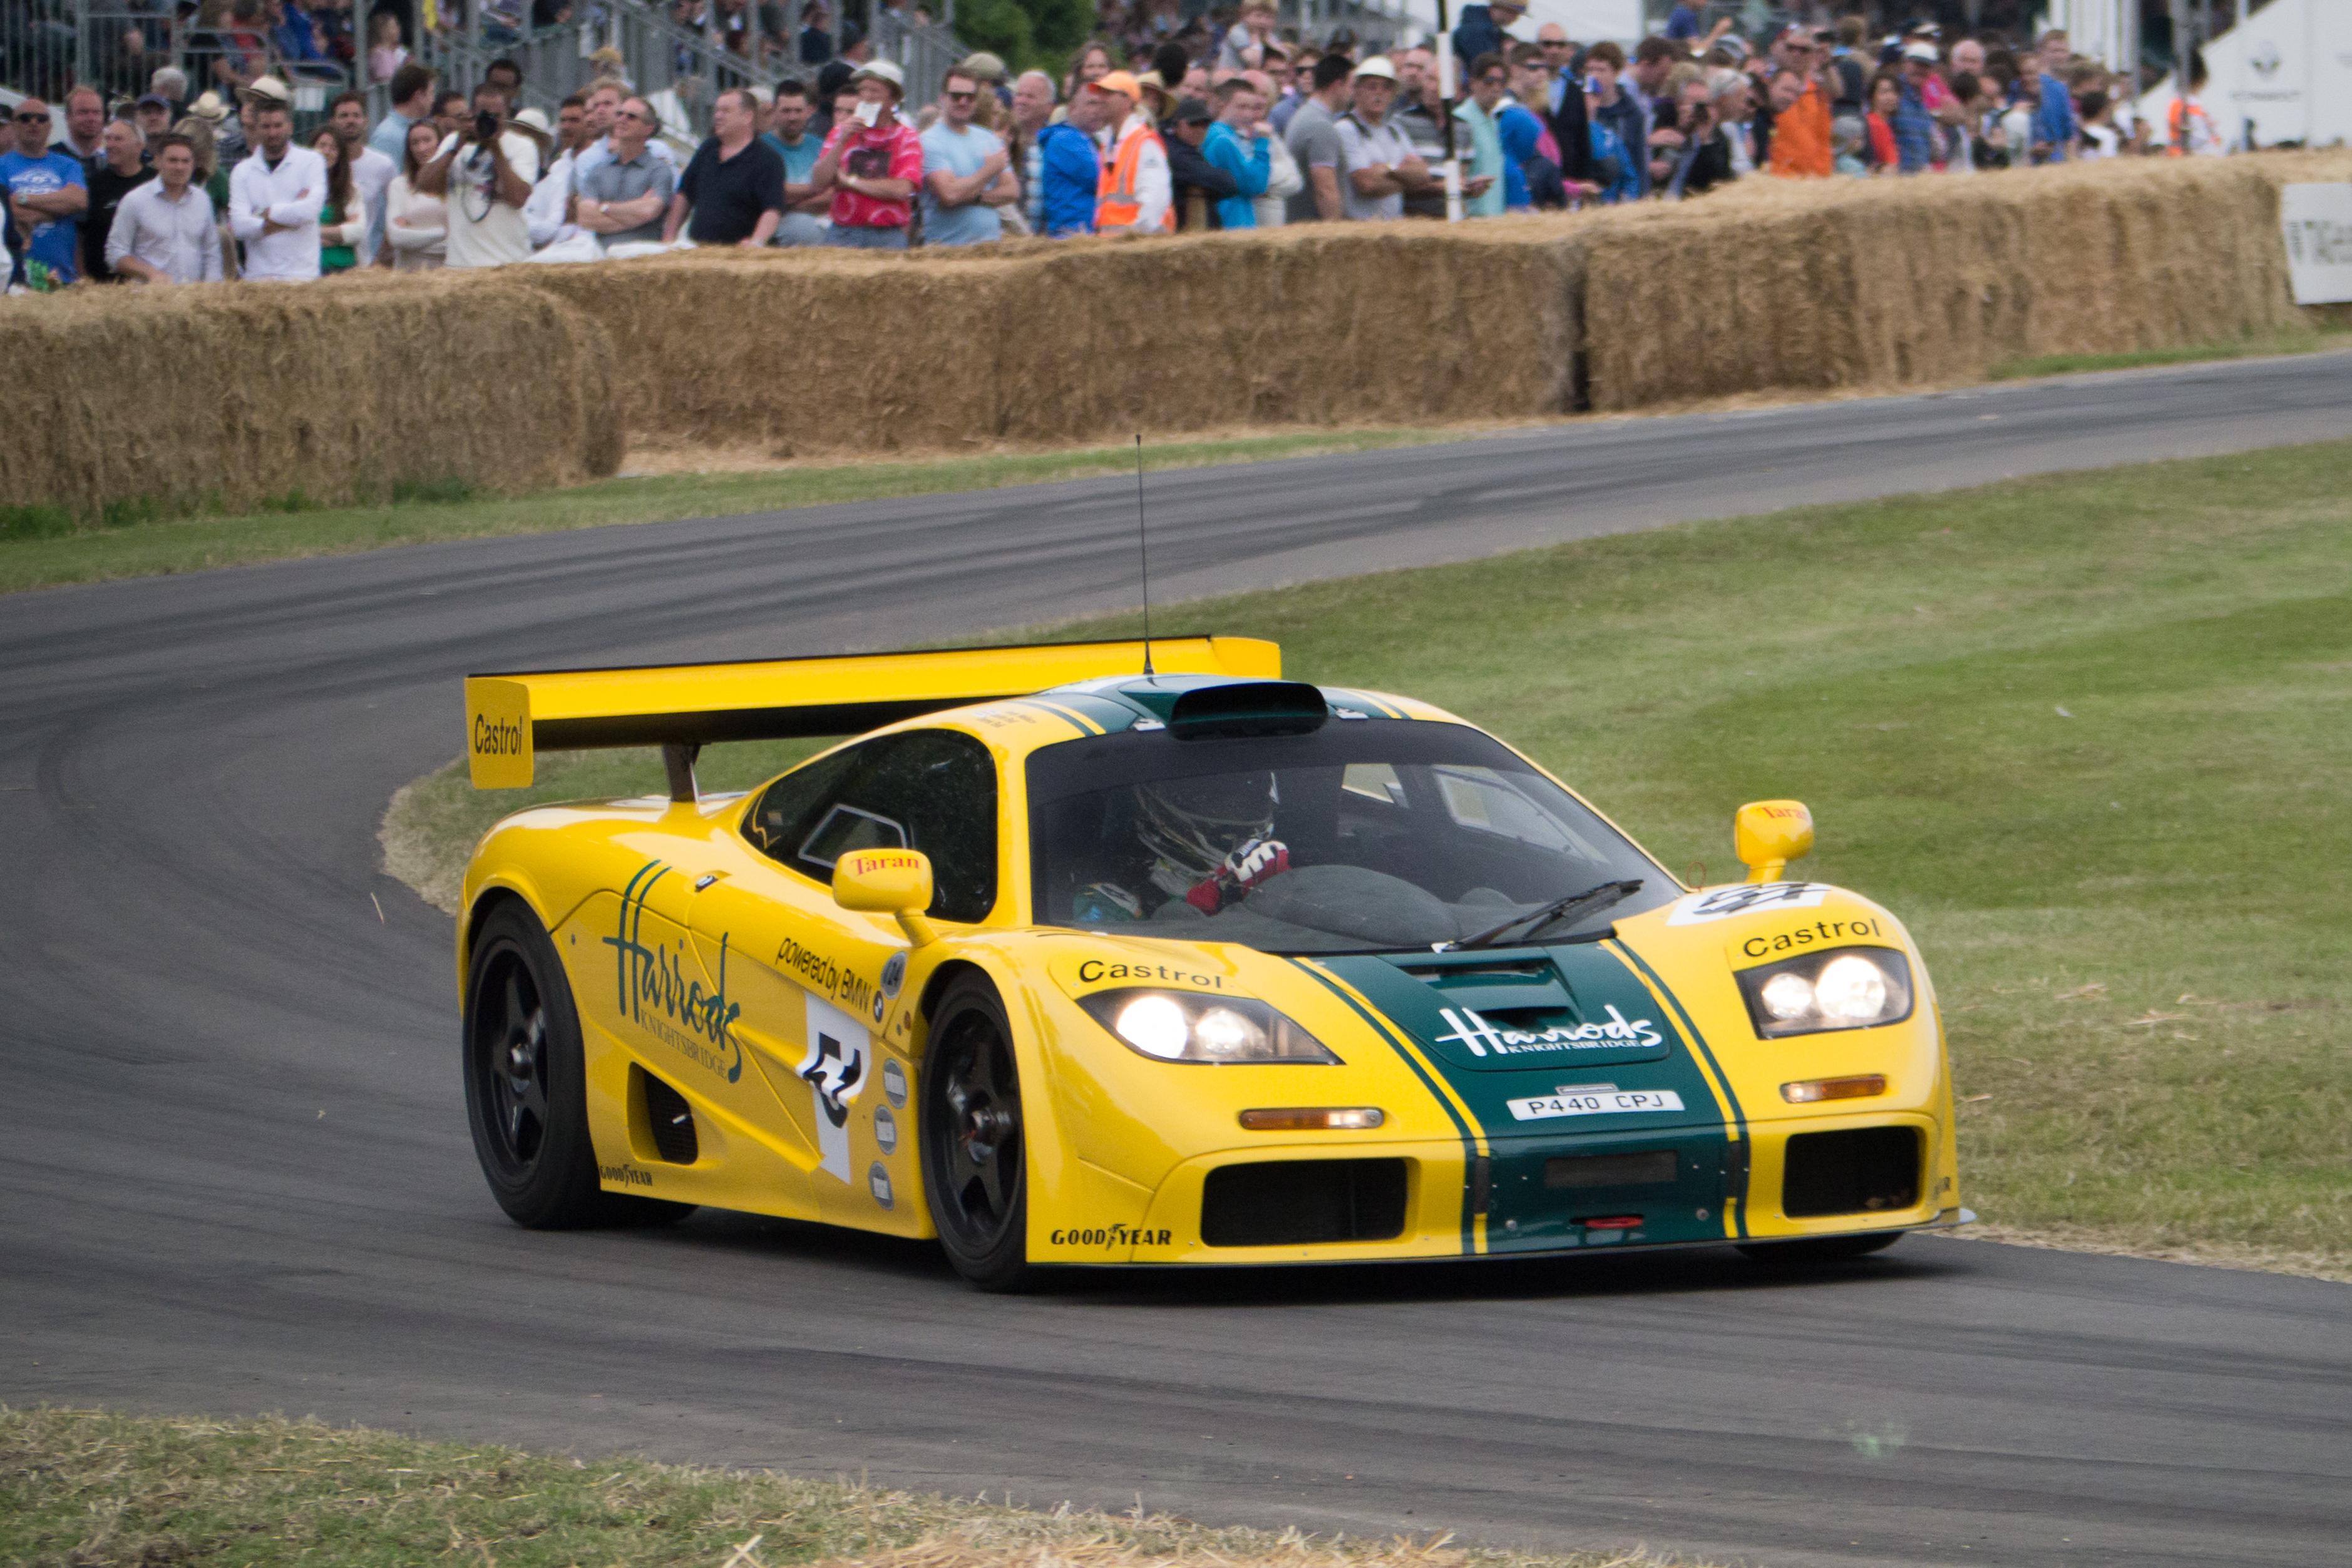 https://upload.wikimedia.org/wikipedia/commons/2/21/1995_McLaren_F1_GTR_%2820195044452%29.jpg